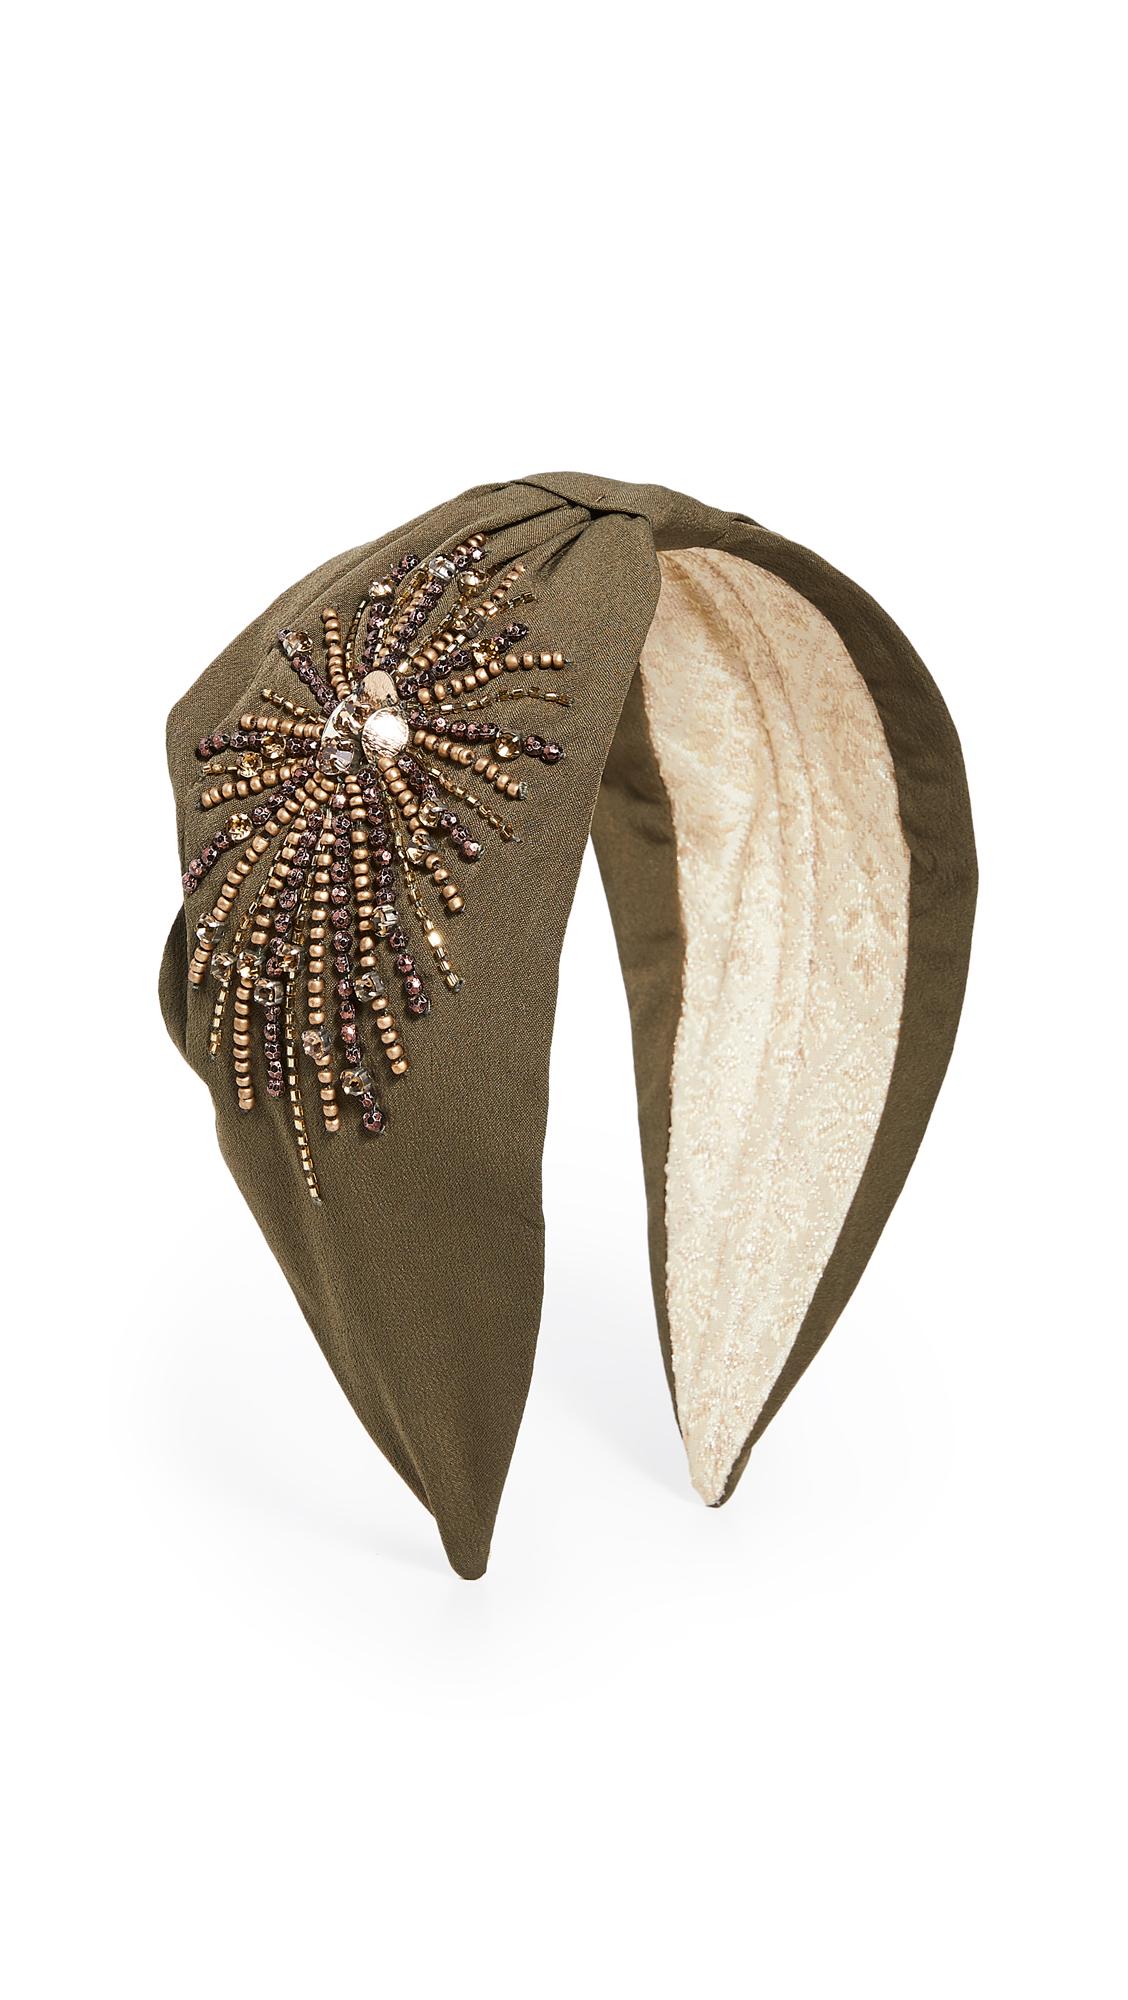 Namjosh Solid Starburst Headband In Olive